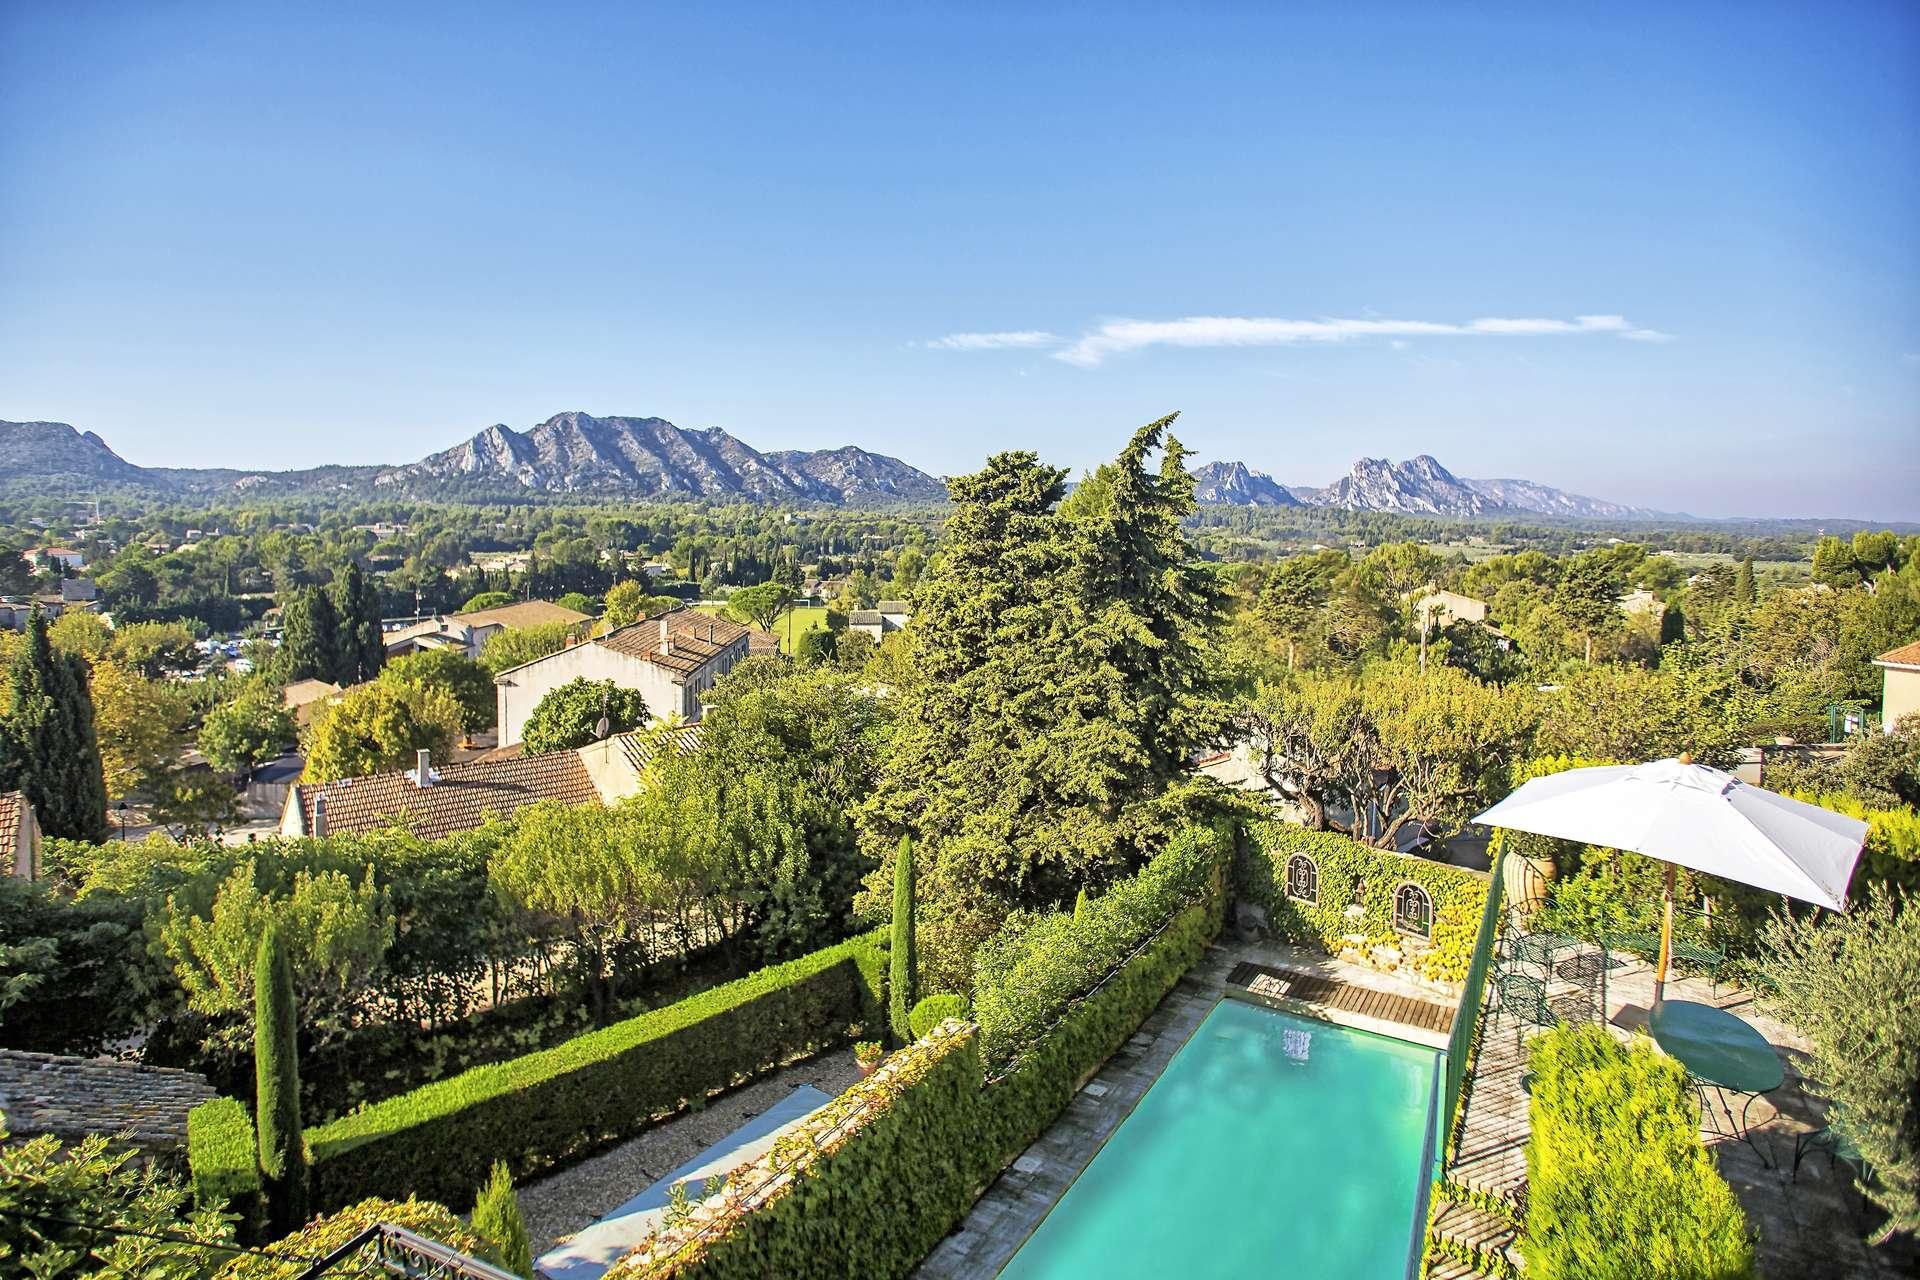 Luxury vacation rentals europe - France - Provence ih - Saint remy de provence - Terrasse des Alpilles - Image 1/24